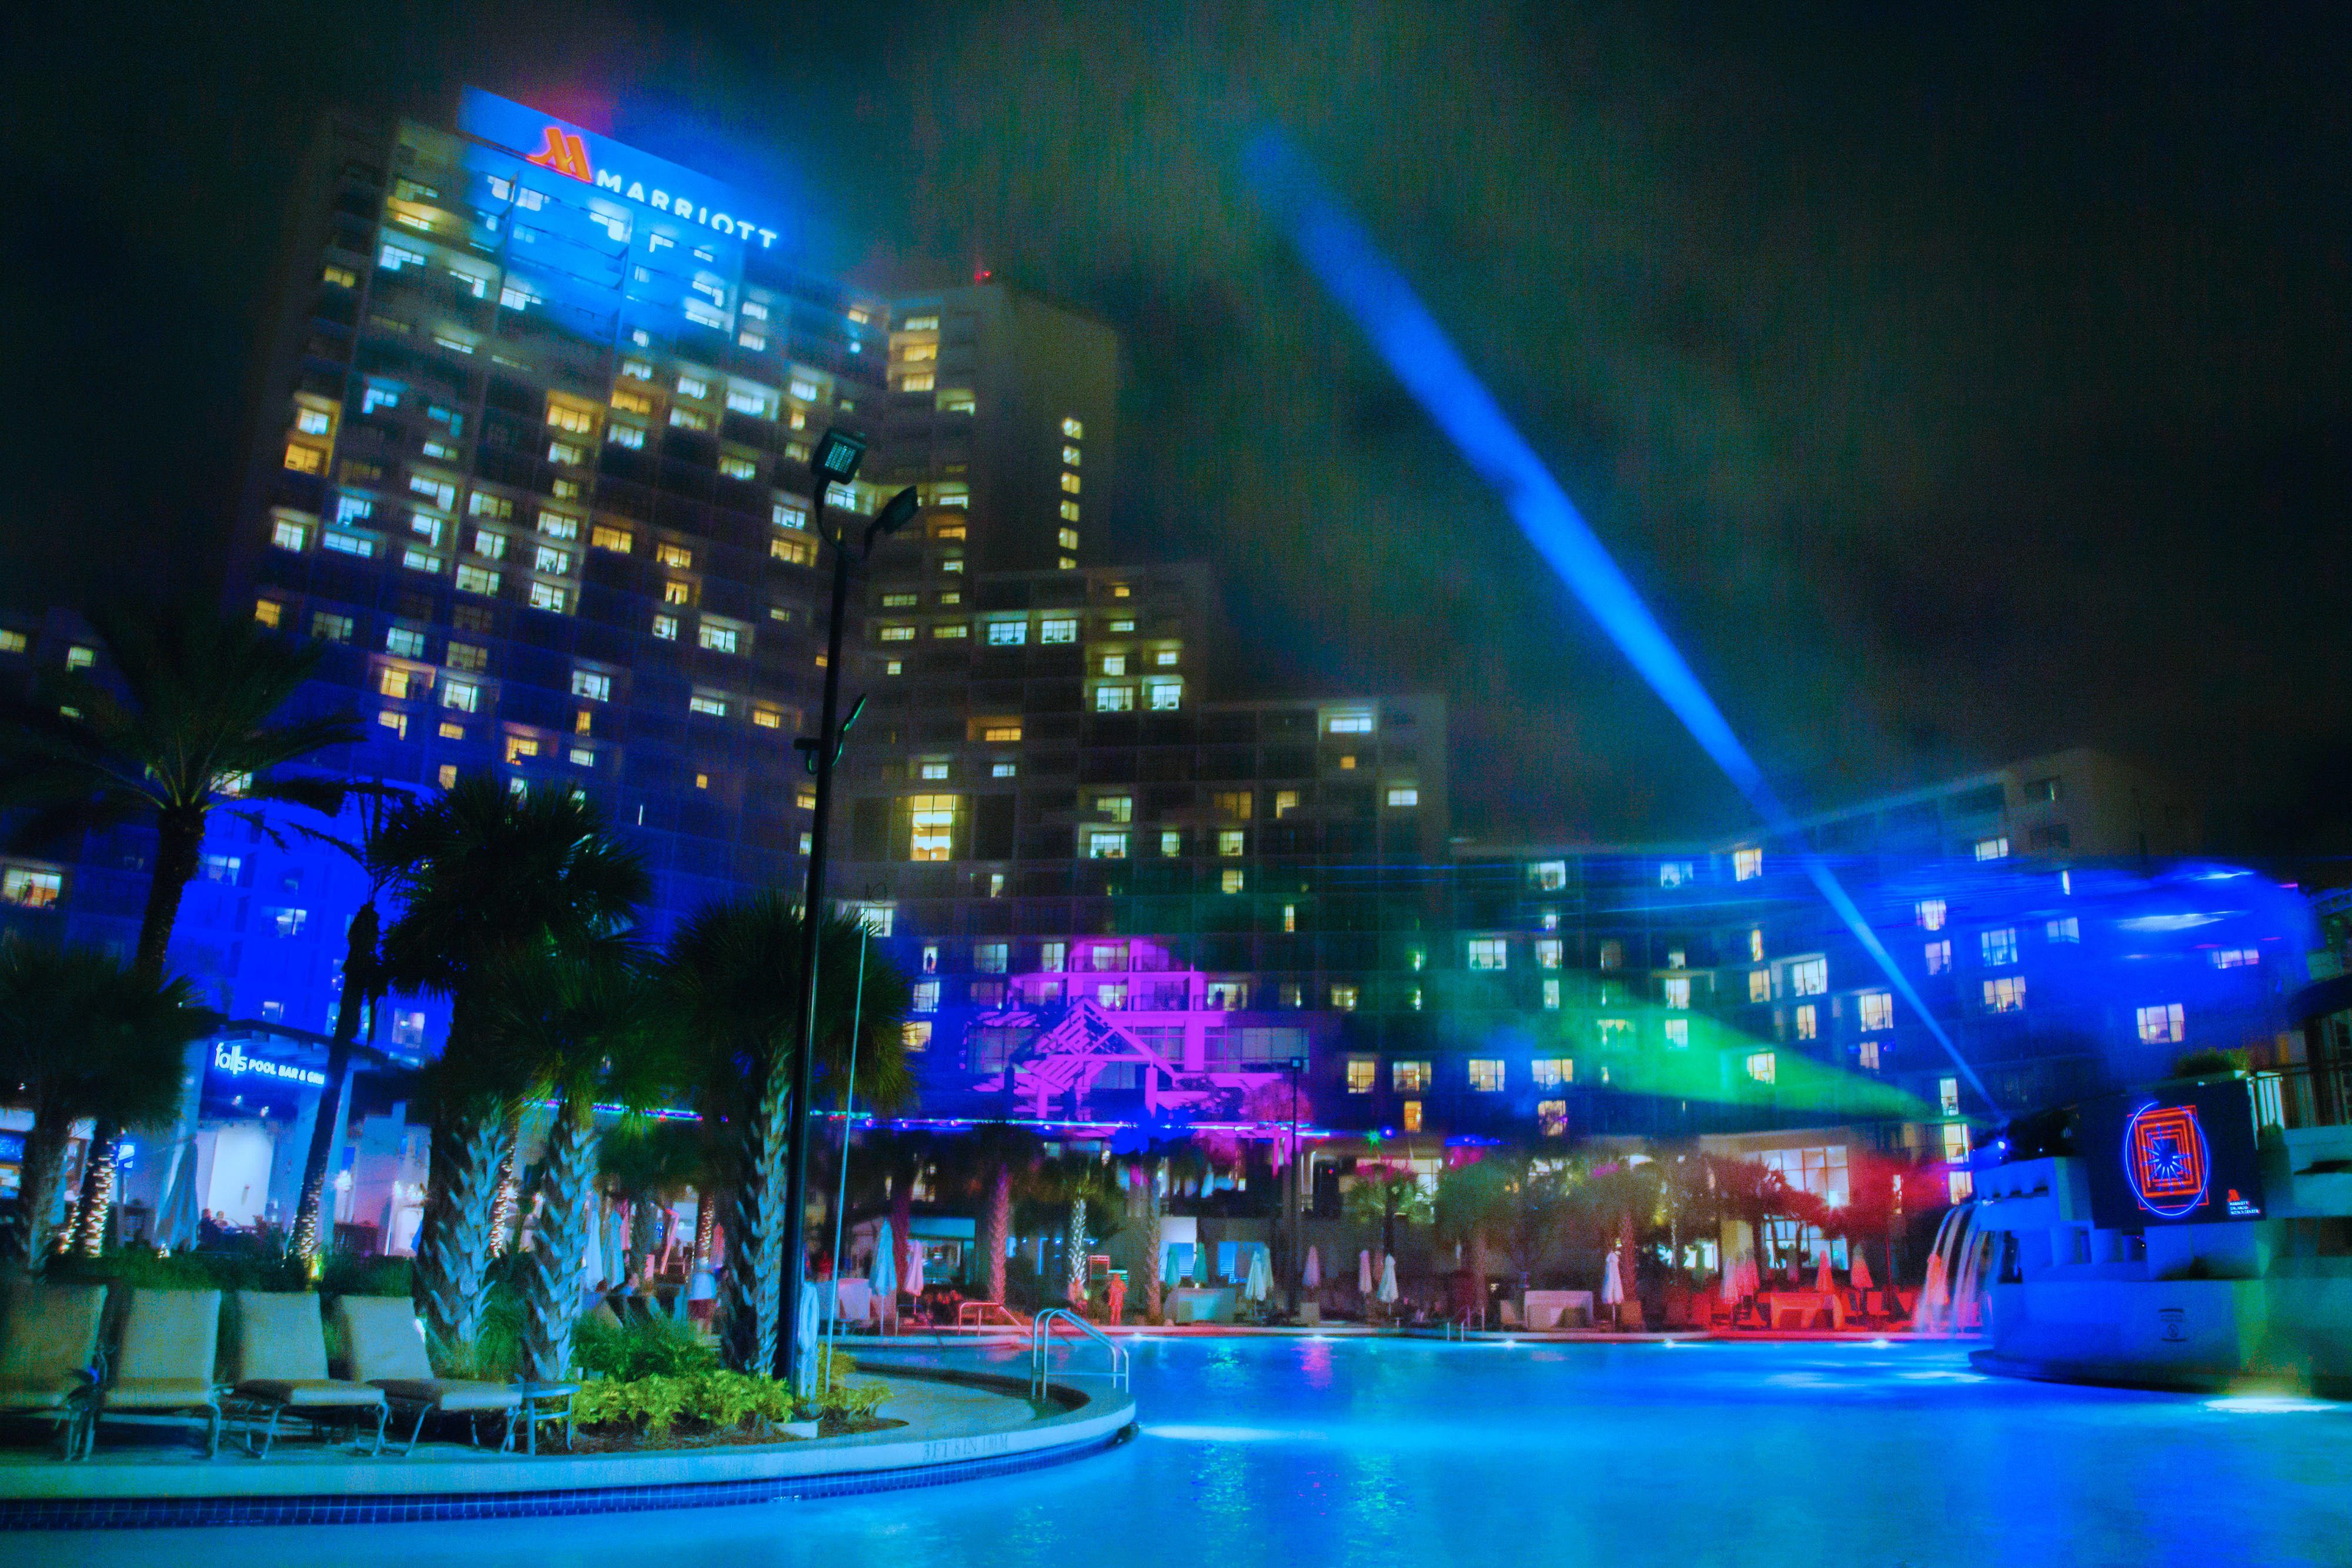 Orlando World Center Marriott Nightly Poolside Laser Light Show Beautiful Guestroom Guestroom Orlando Florida Hotels Florida Resorts Hotel